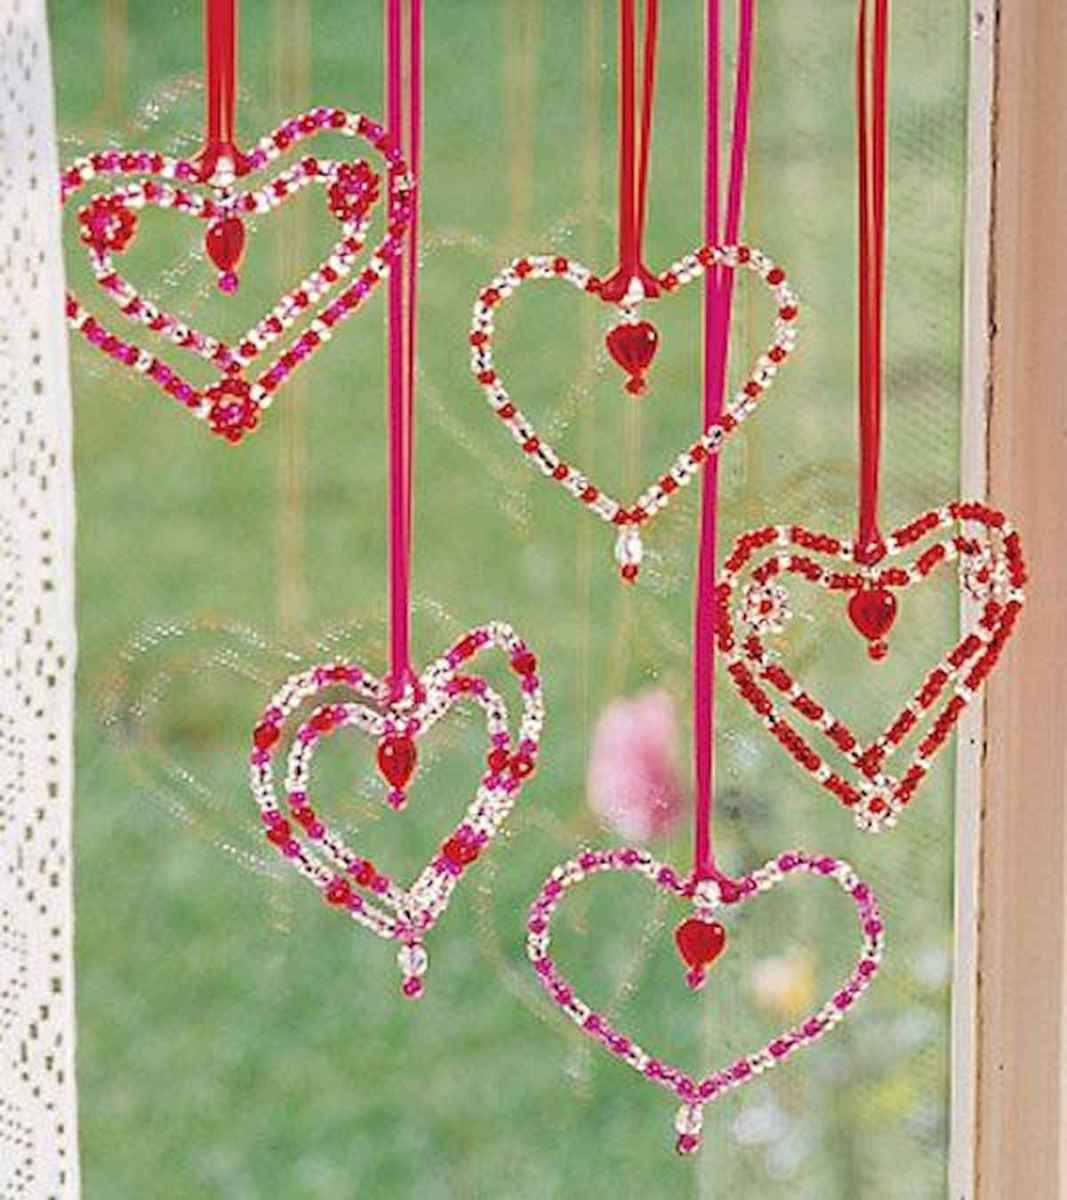 75 Romantic Valentines Day Crafts Design Ideas (31)